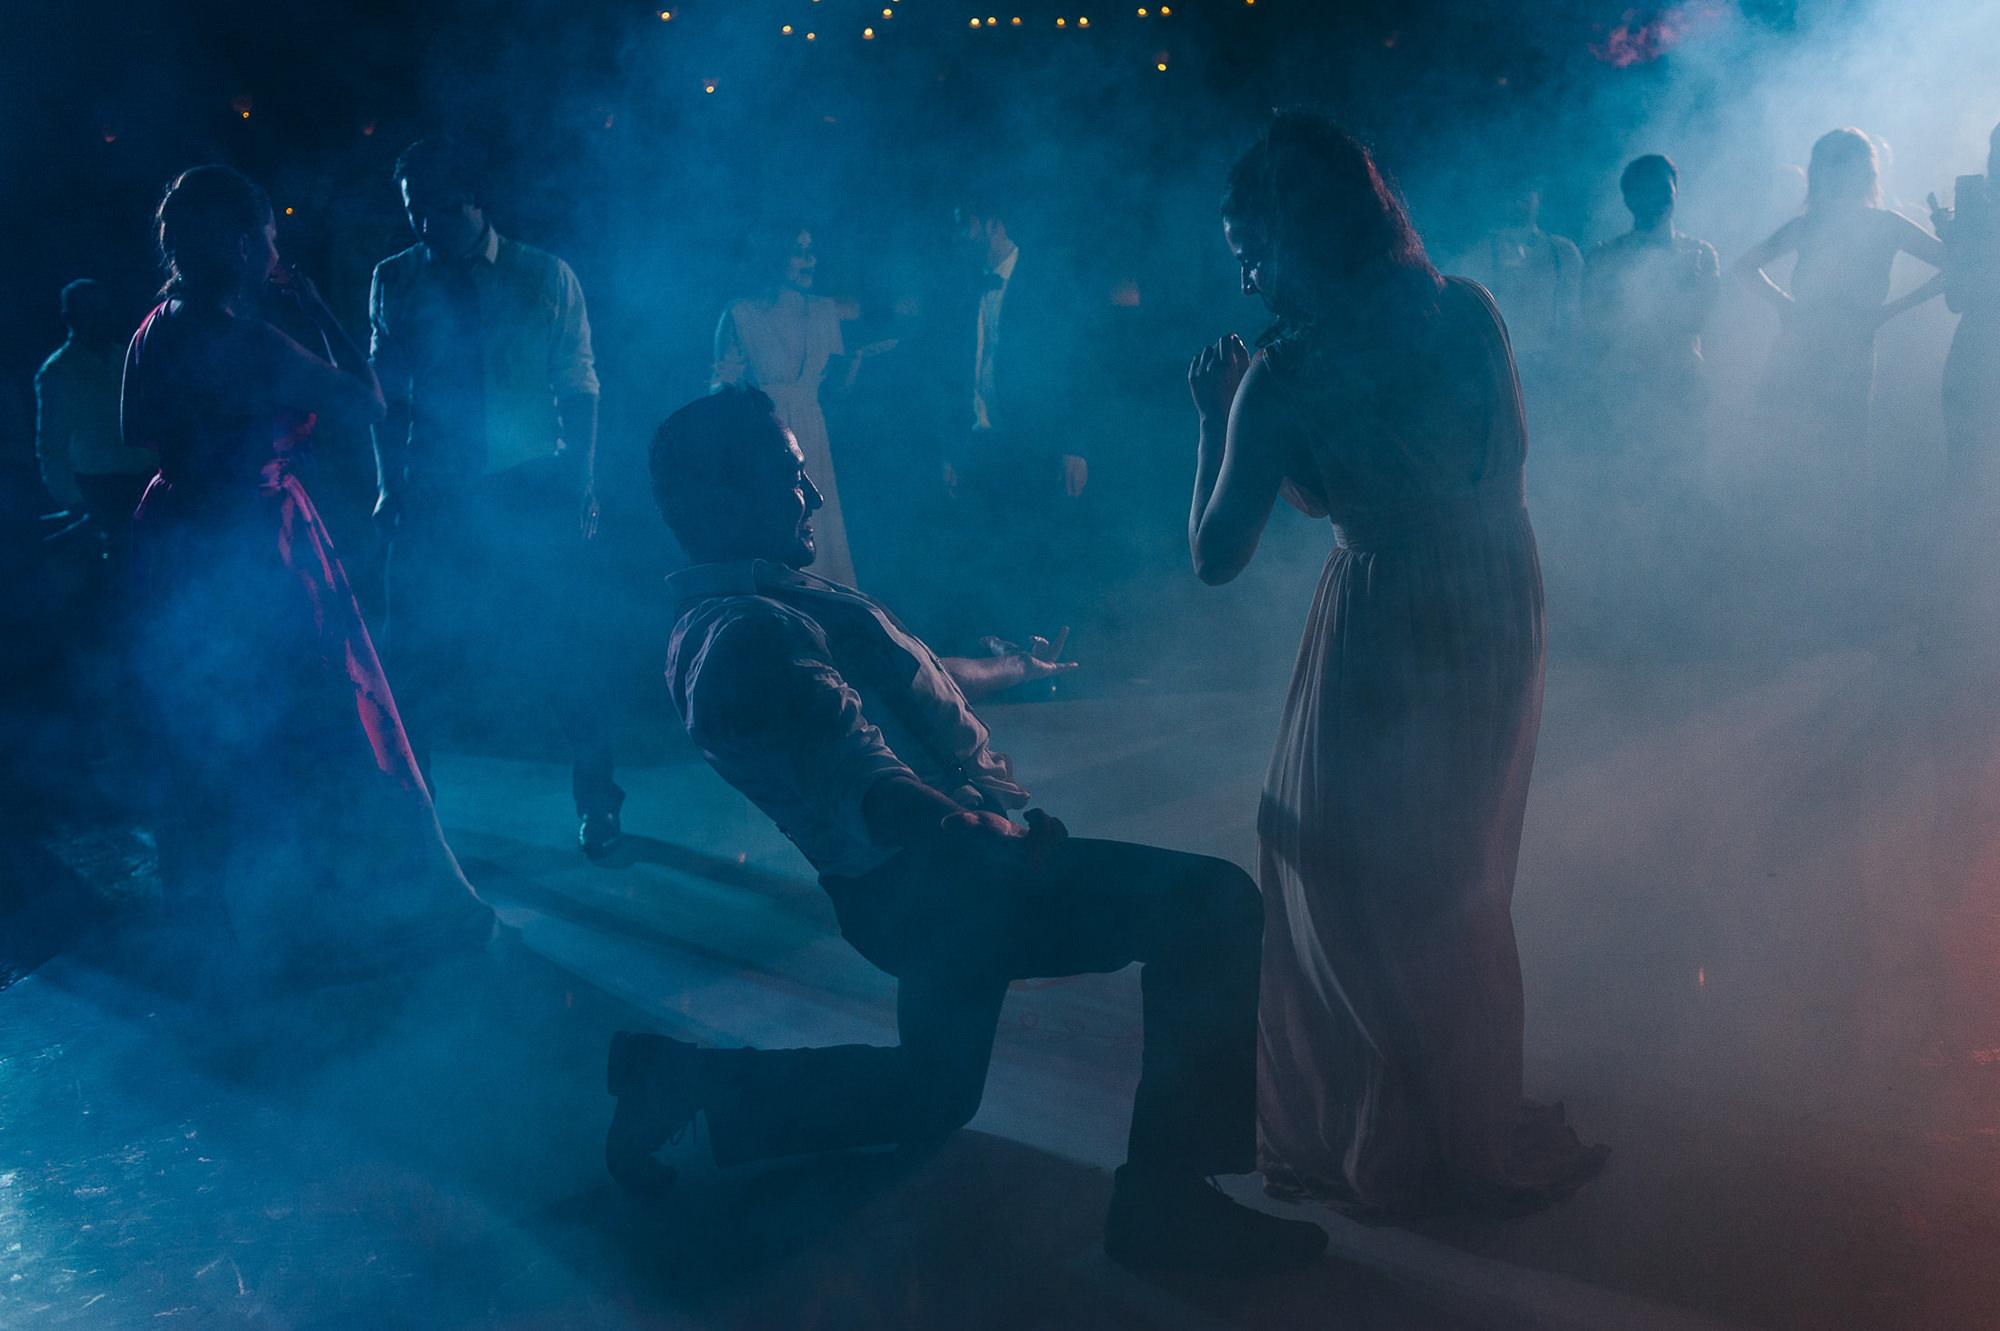 Bride and groom dancing in smoky reception dance floor, by Citlalli Rico